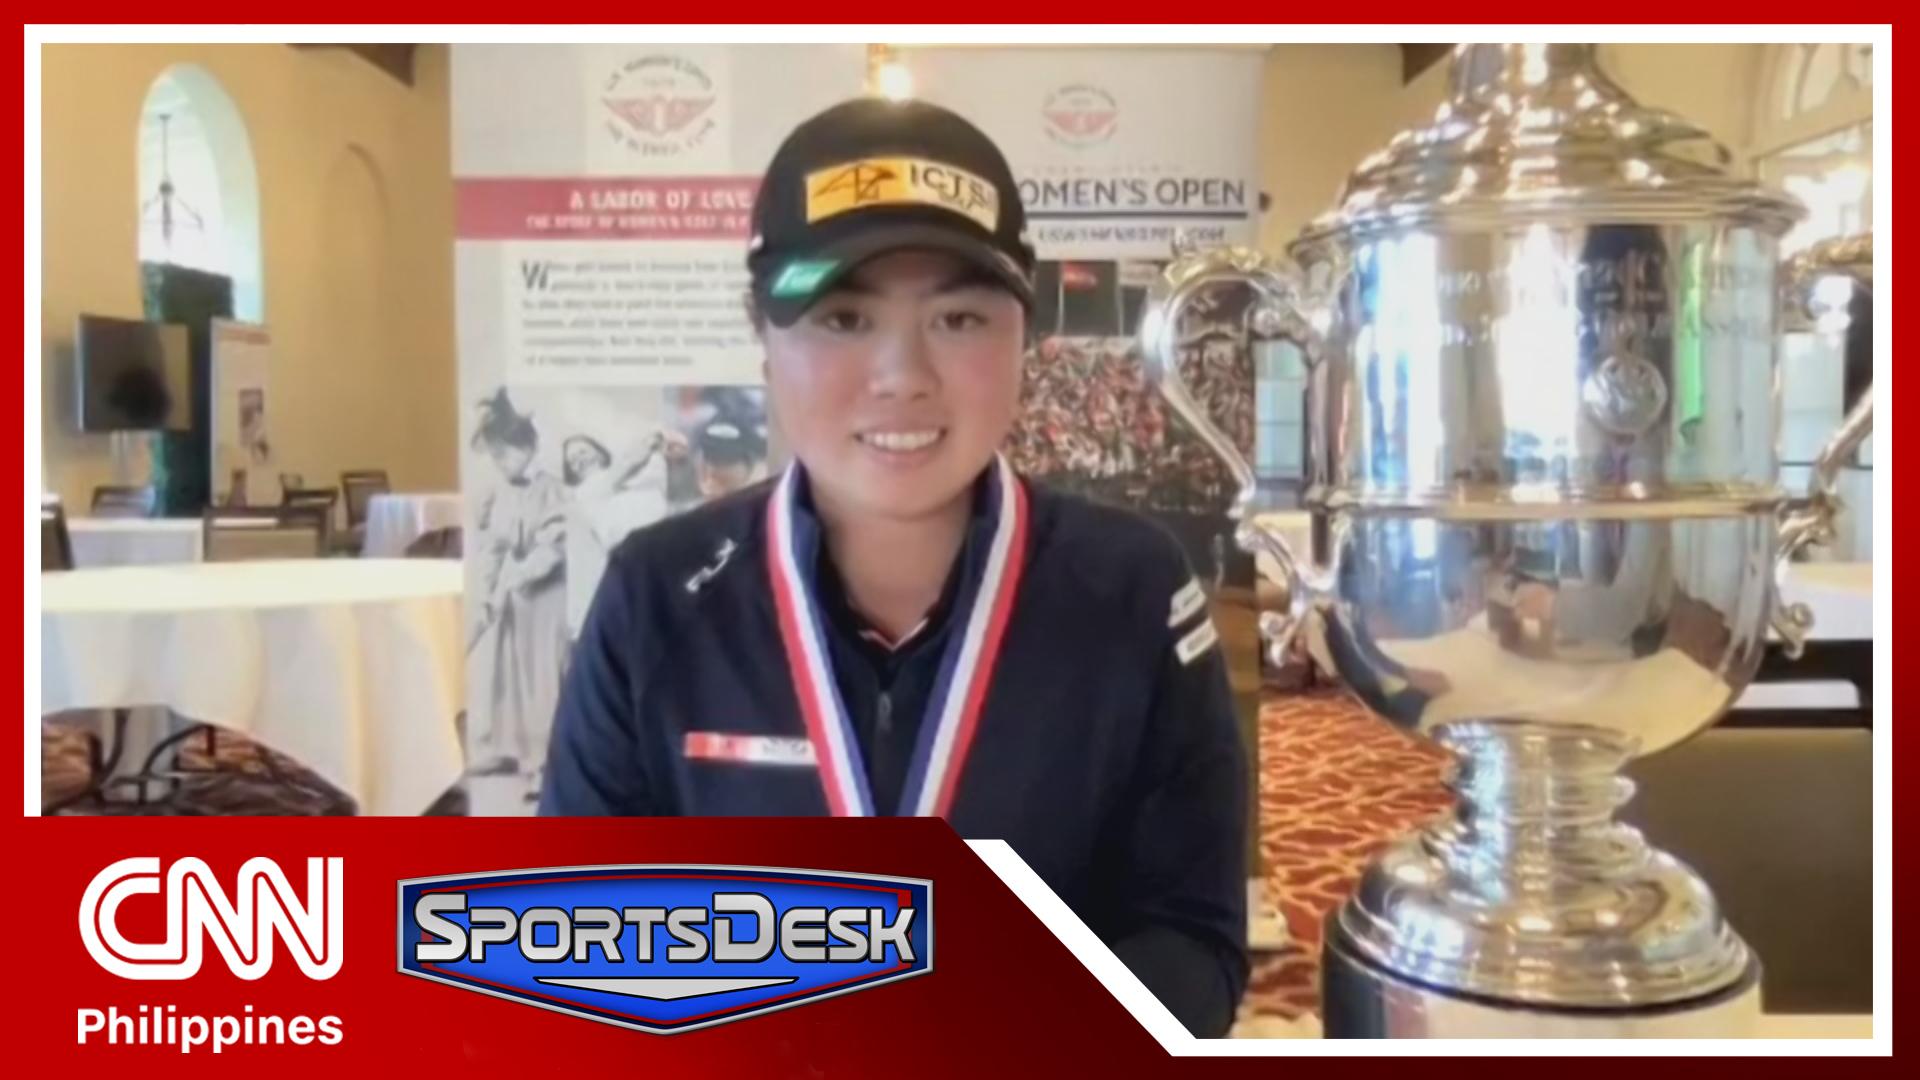 Filipino golfer Yuka Saso wins U.S. Women's Open Championship | Sportsdesk